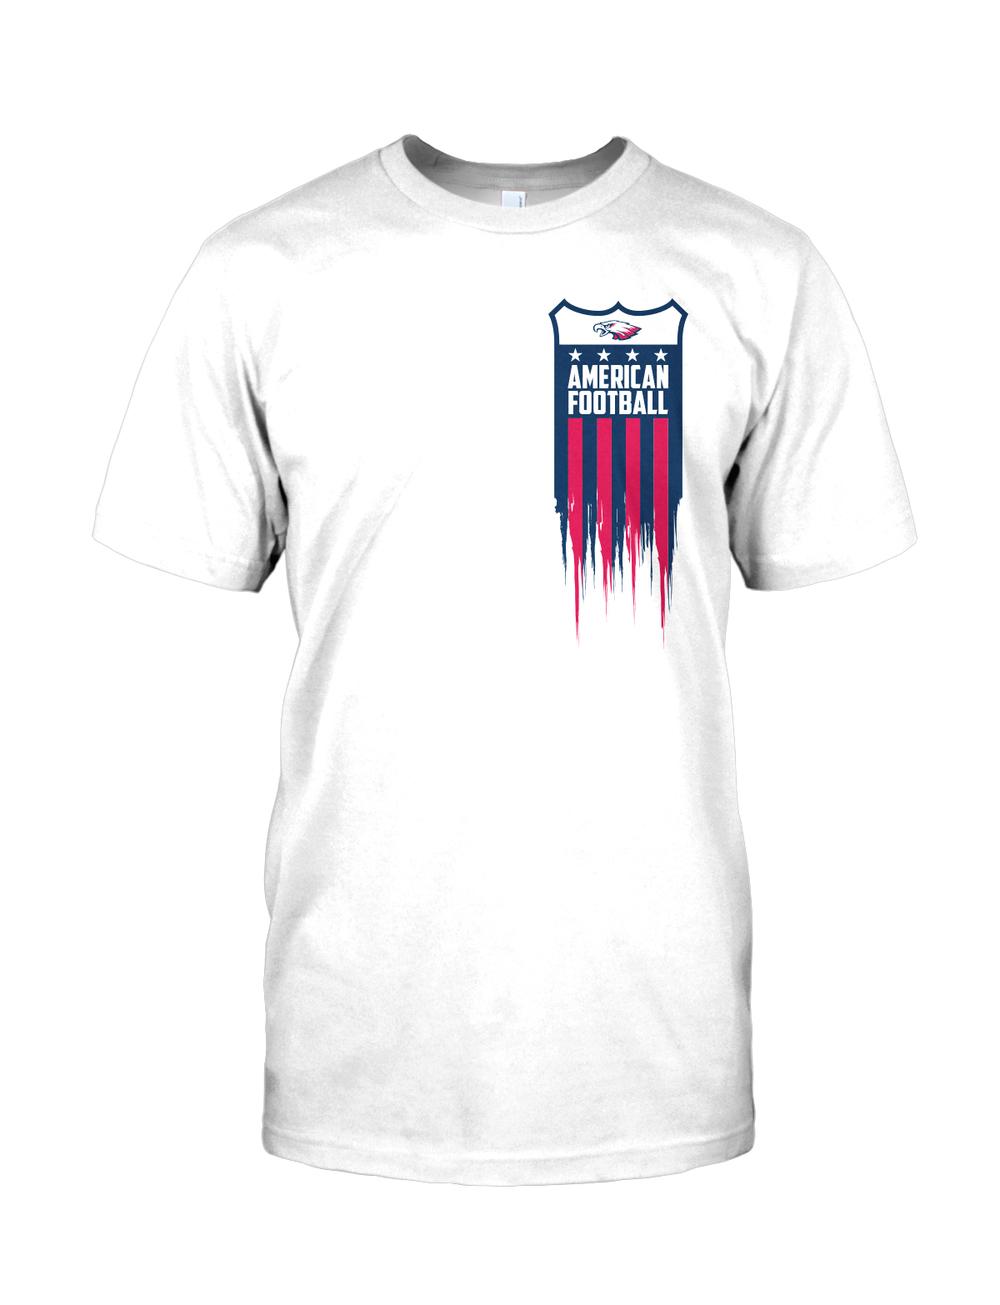 Tee-Design-Shirt1_o.jpg